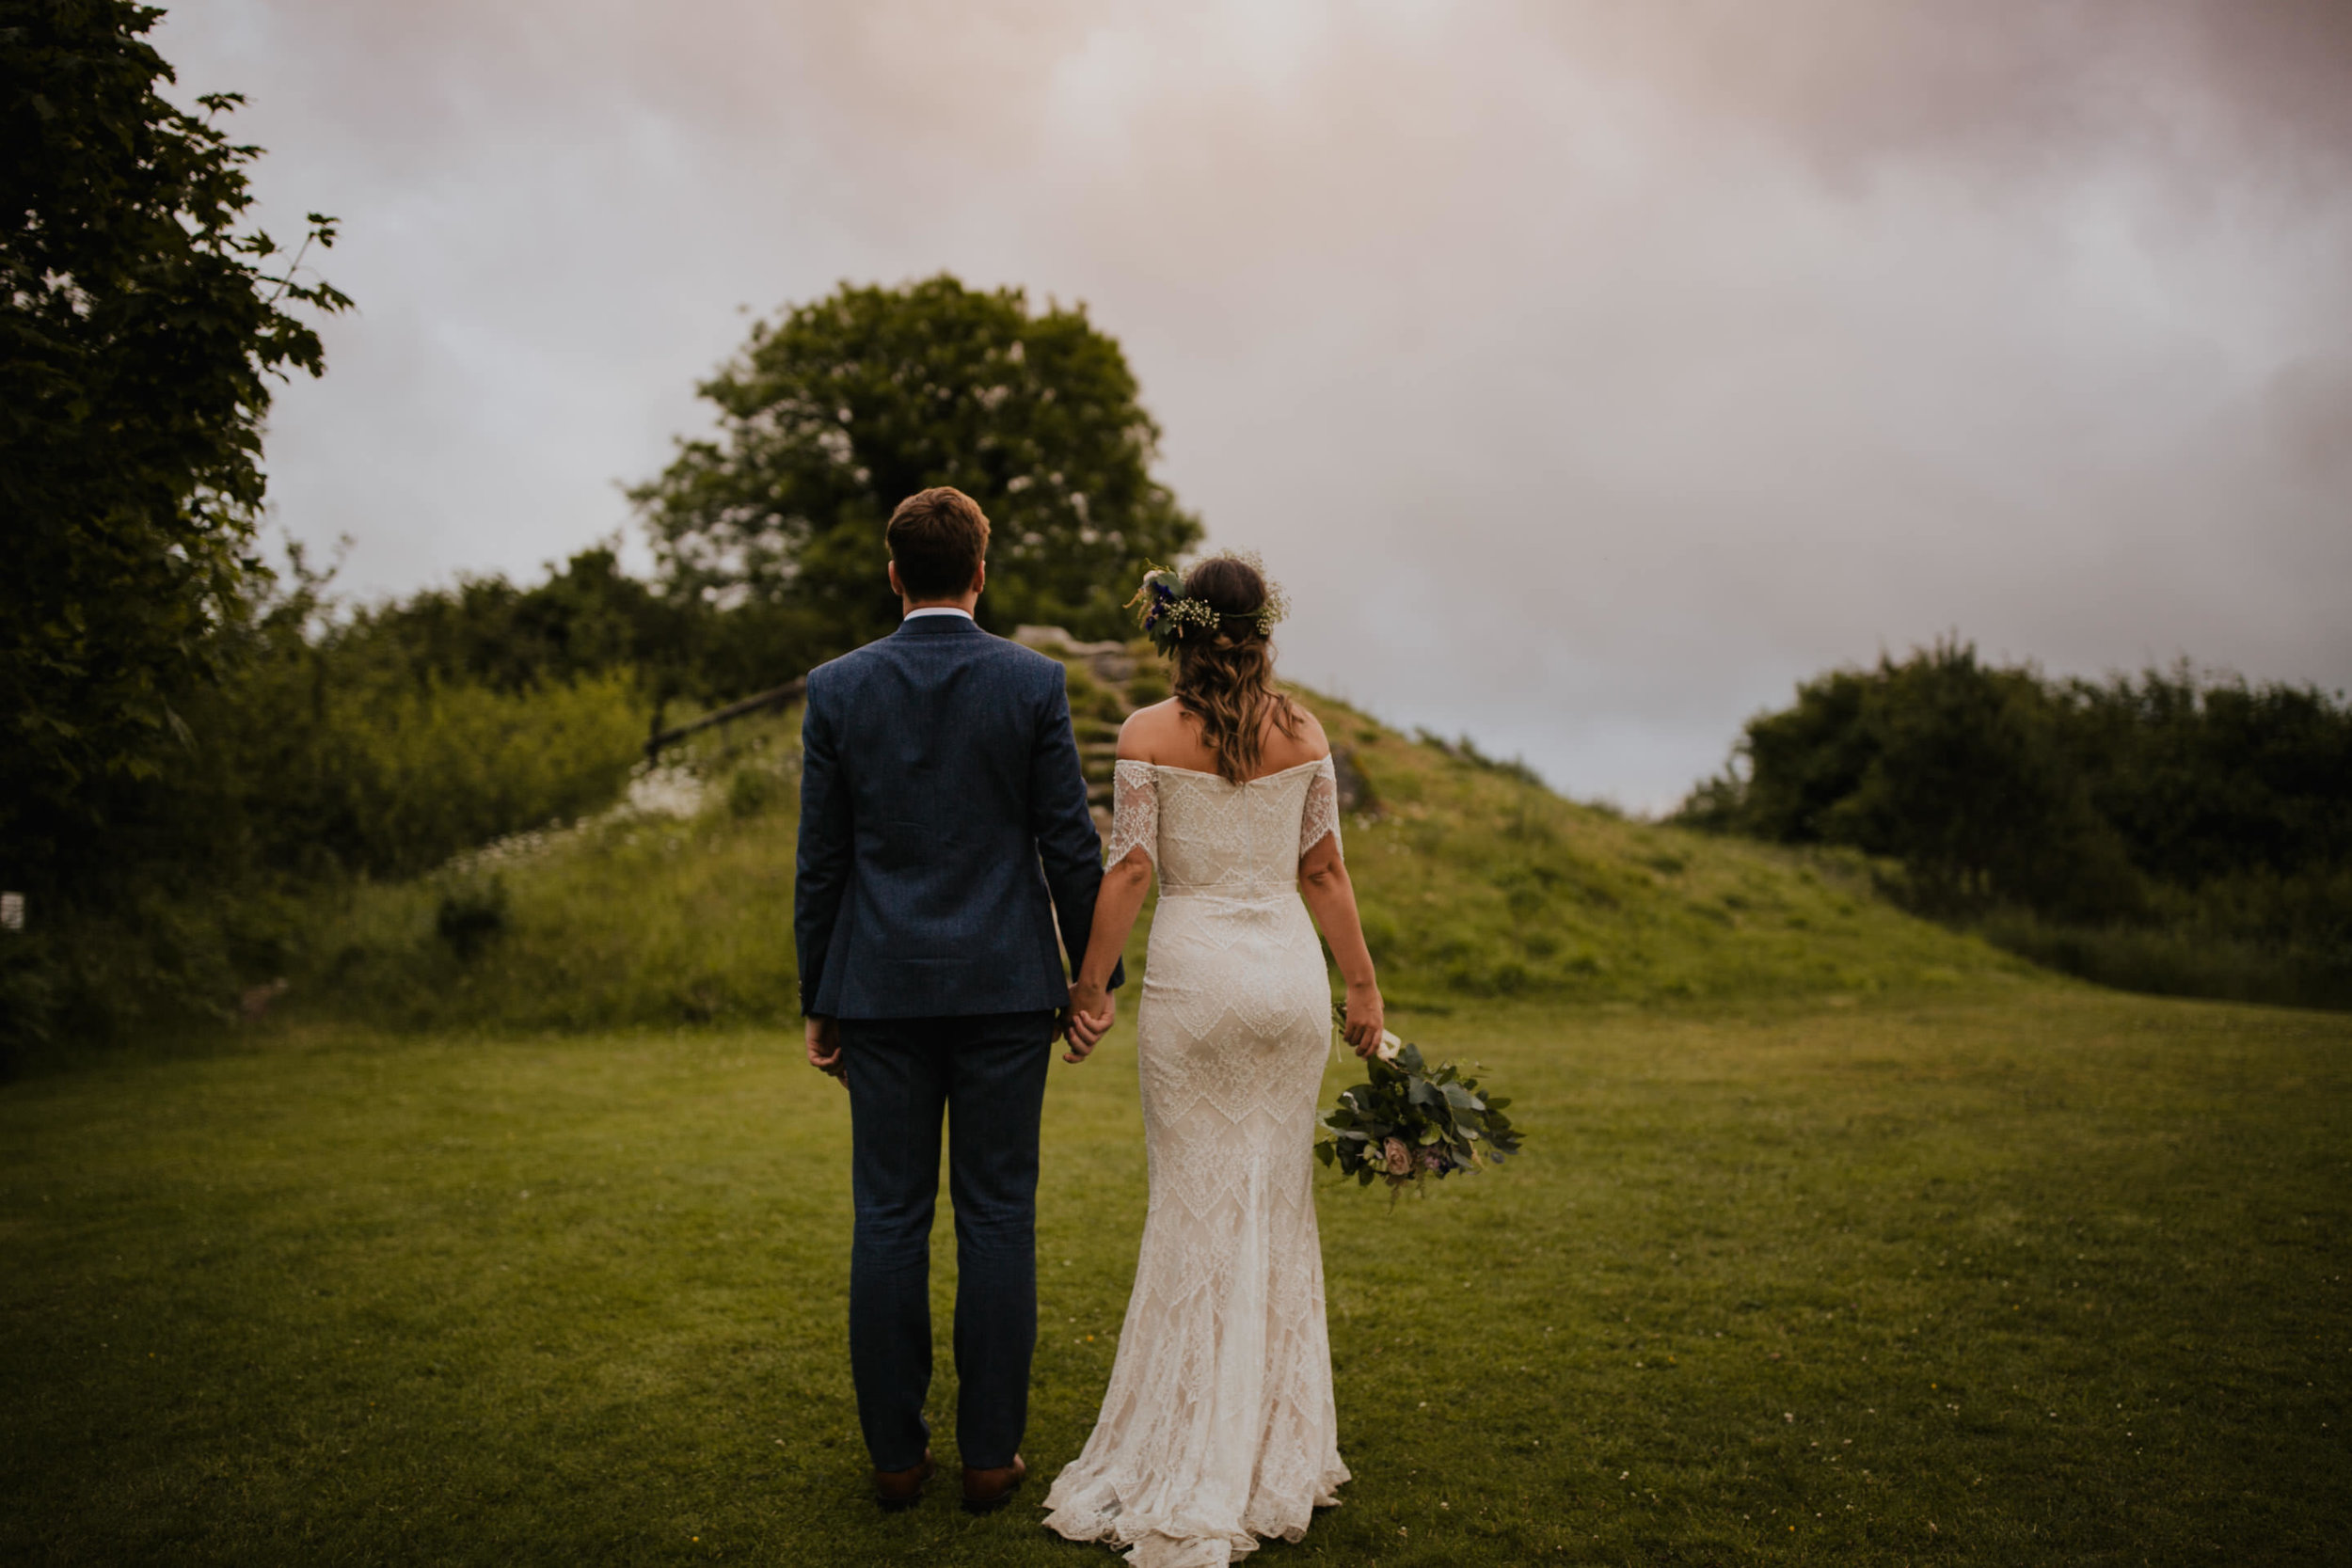 c&j_brigits_garden_galway_wedding_photographer_livia_figueiredo_32.jpg